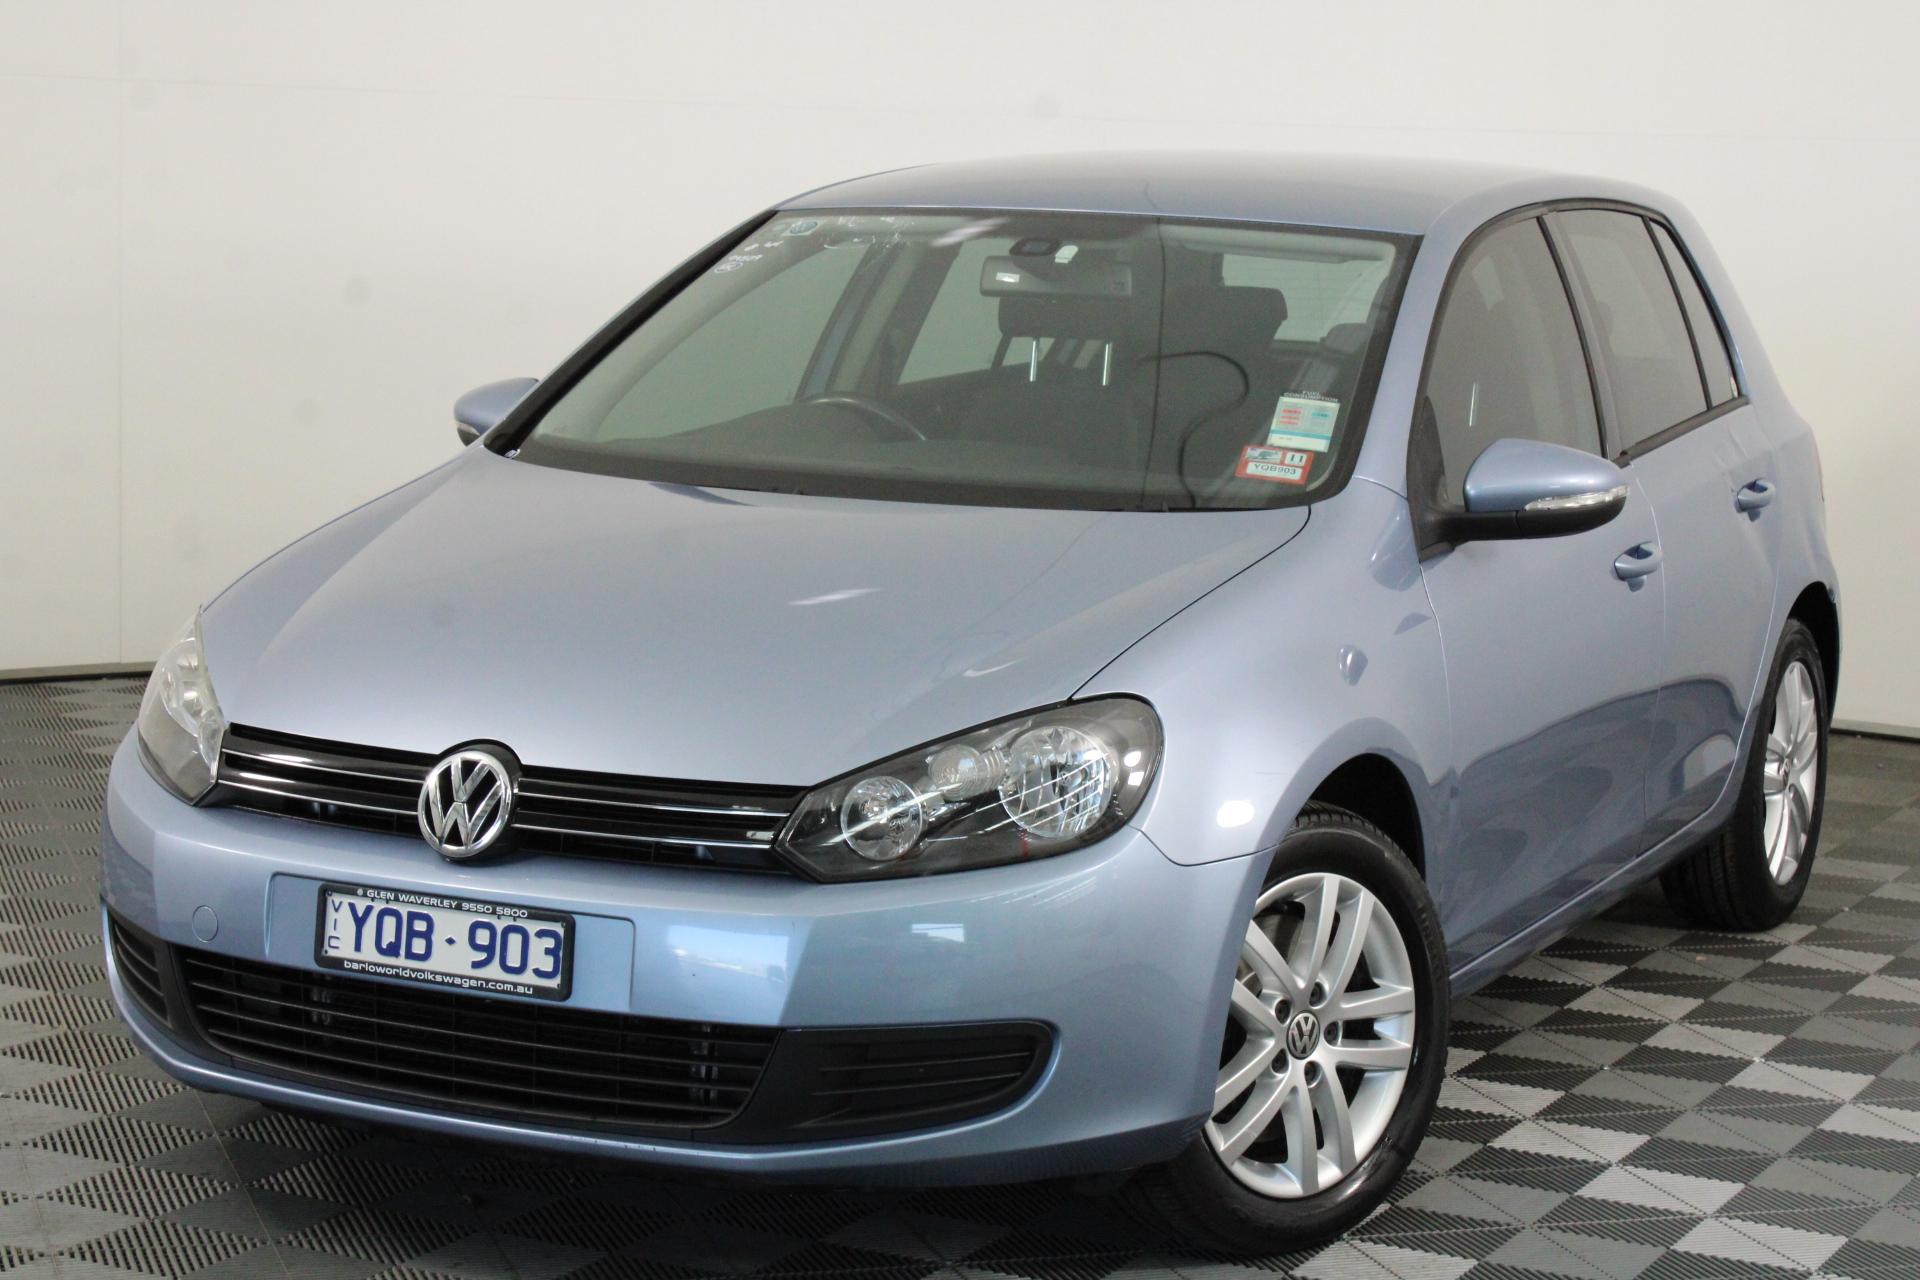 2011 Volkswagen Golf 118TSI Comfortline A6 Automatic Hatchback